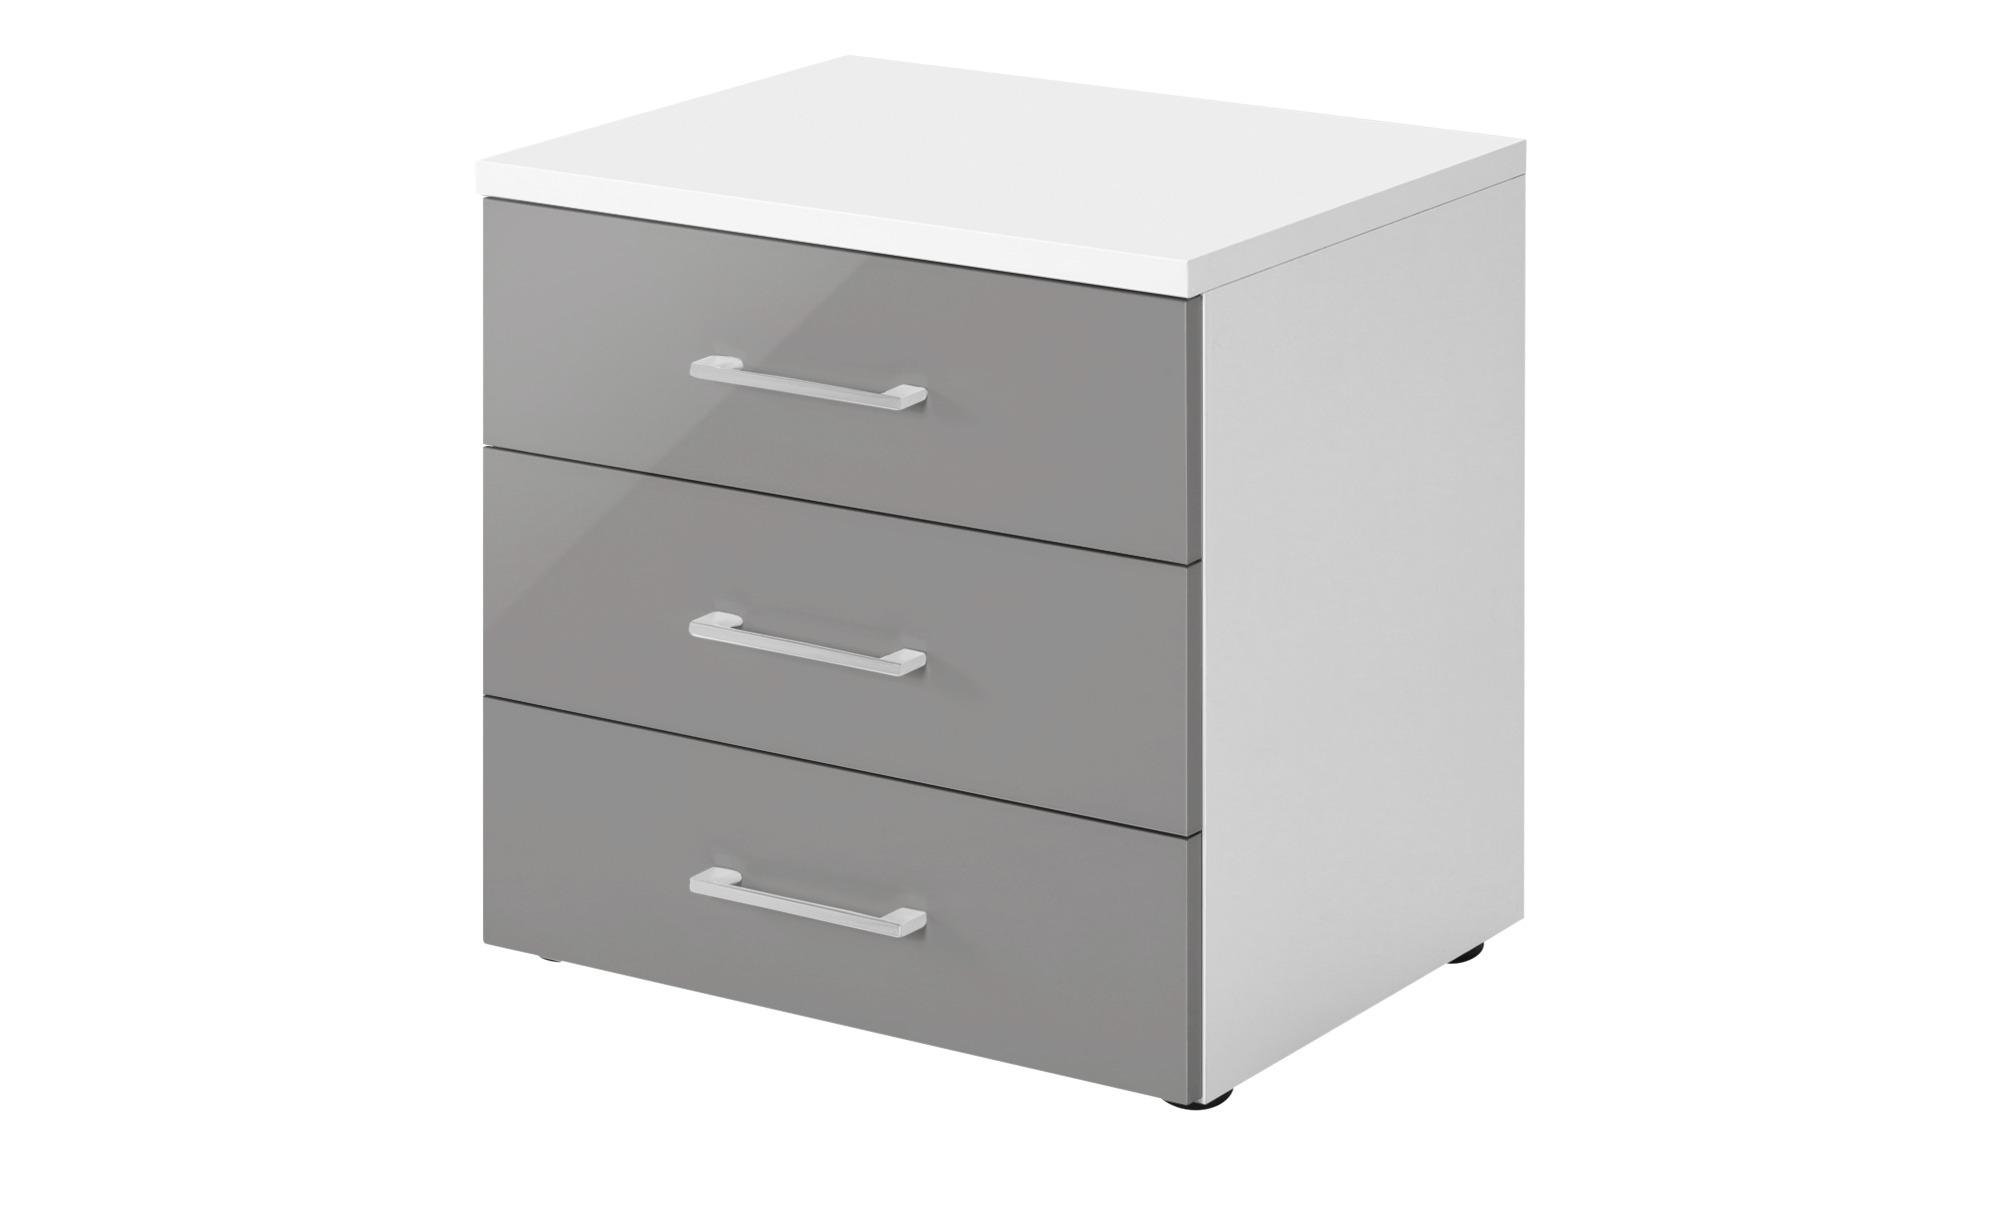 nachtkommode colors breite 50 cm h he 62 cm grau online kaufen bei woonio. Black Bedroom Furniture Sets. Home Design Ideas